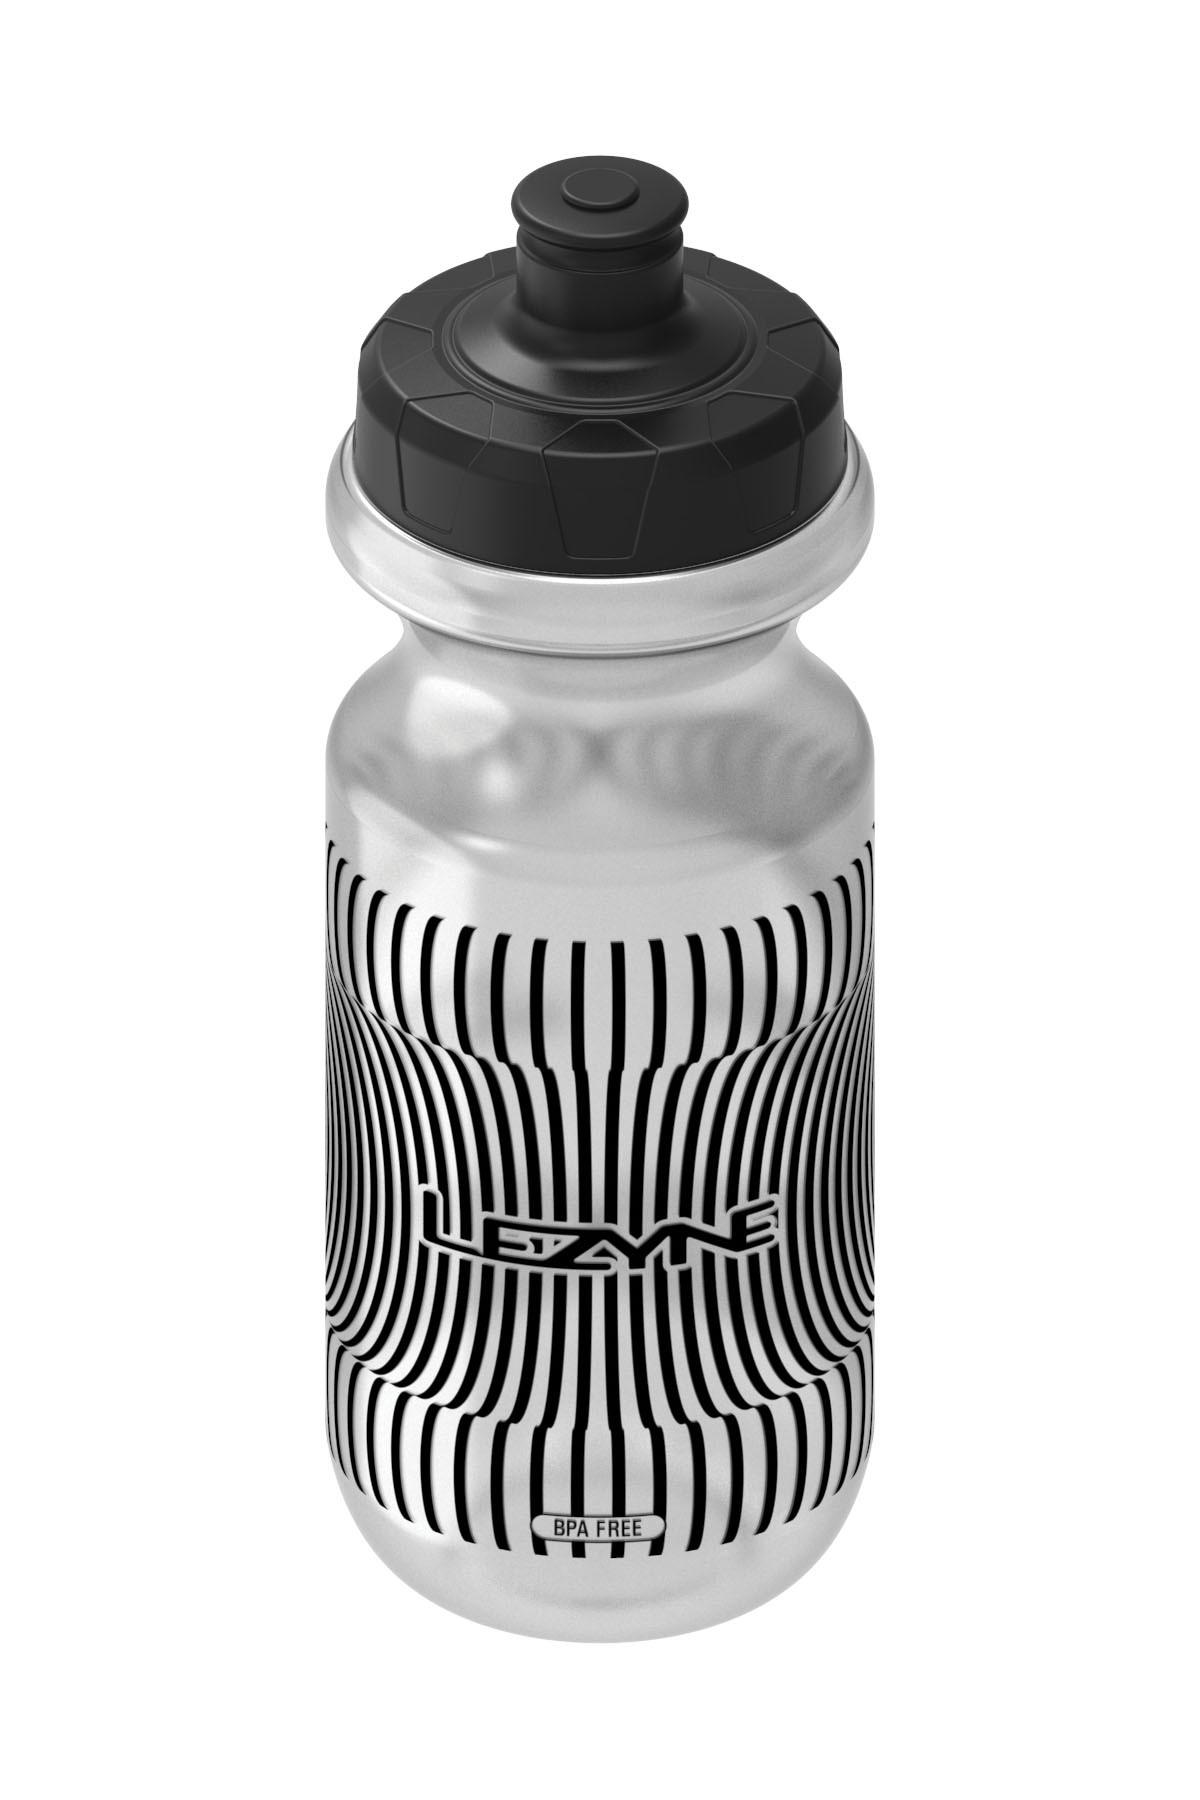 Lezyne cyklofľaša Flow Bottle biela 600 ml, matná, priehľadná